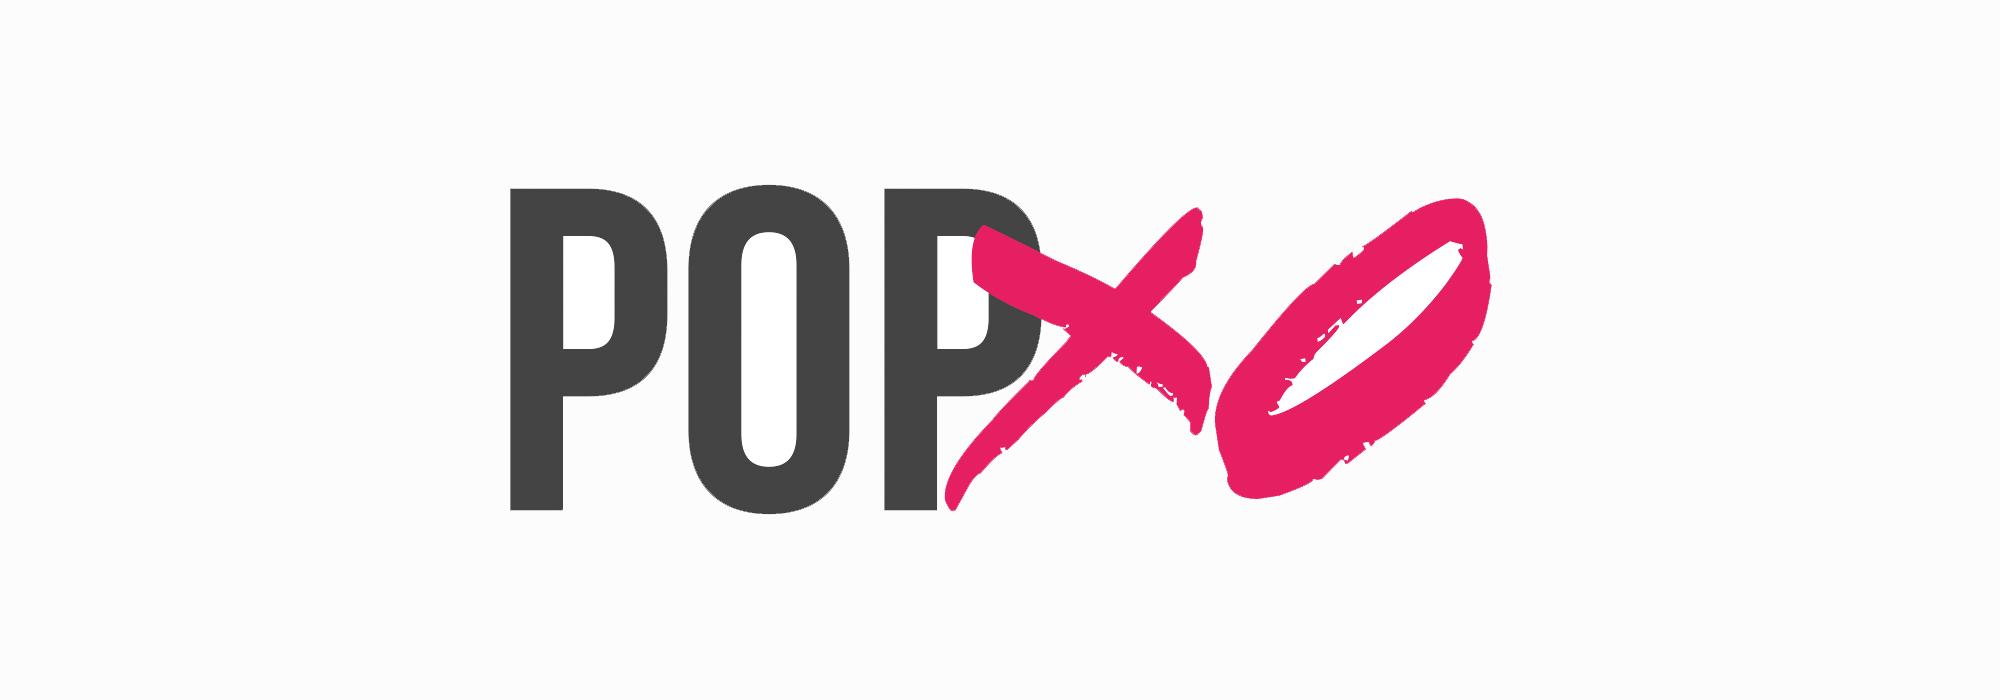 Popxo2.png